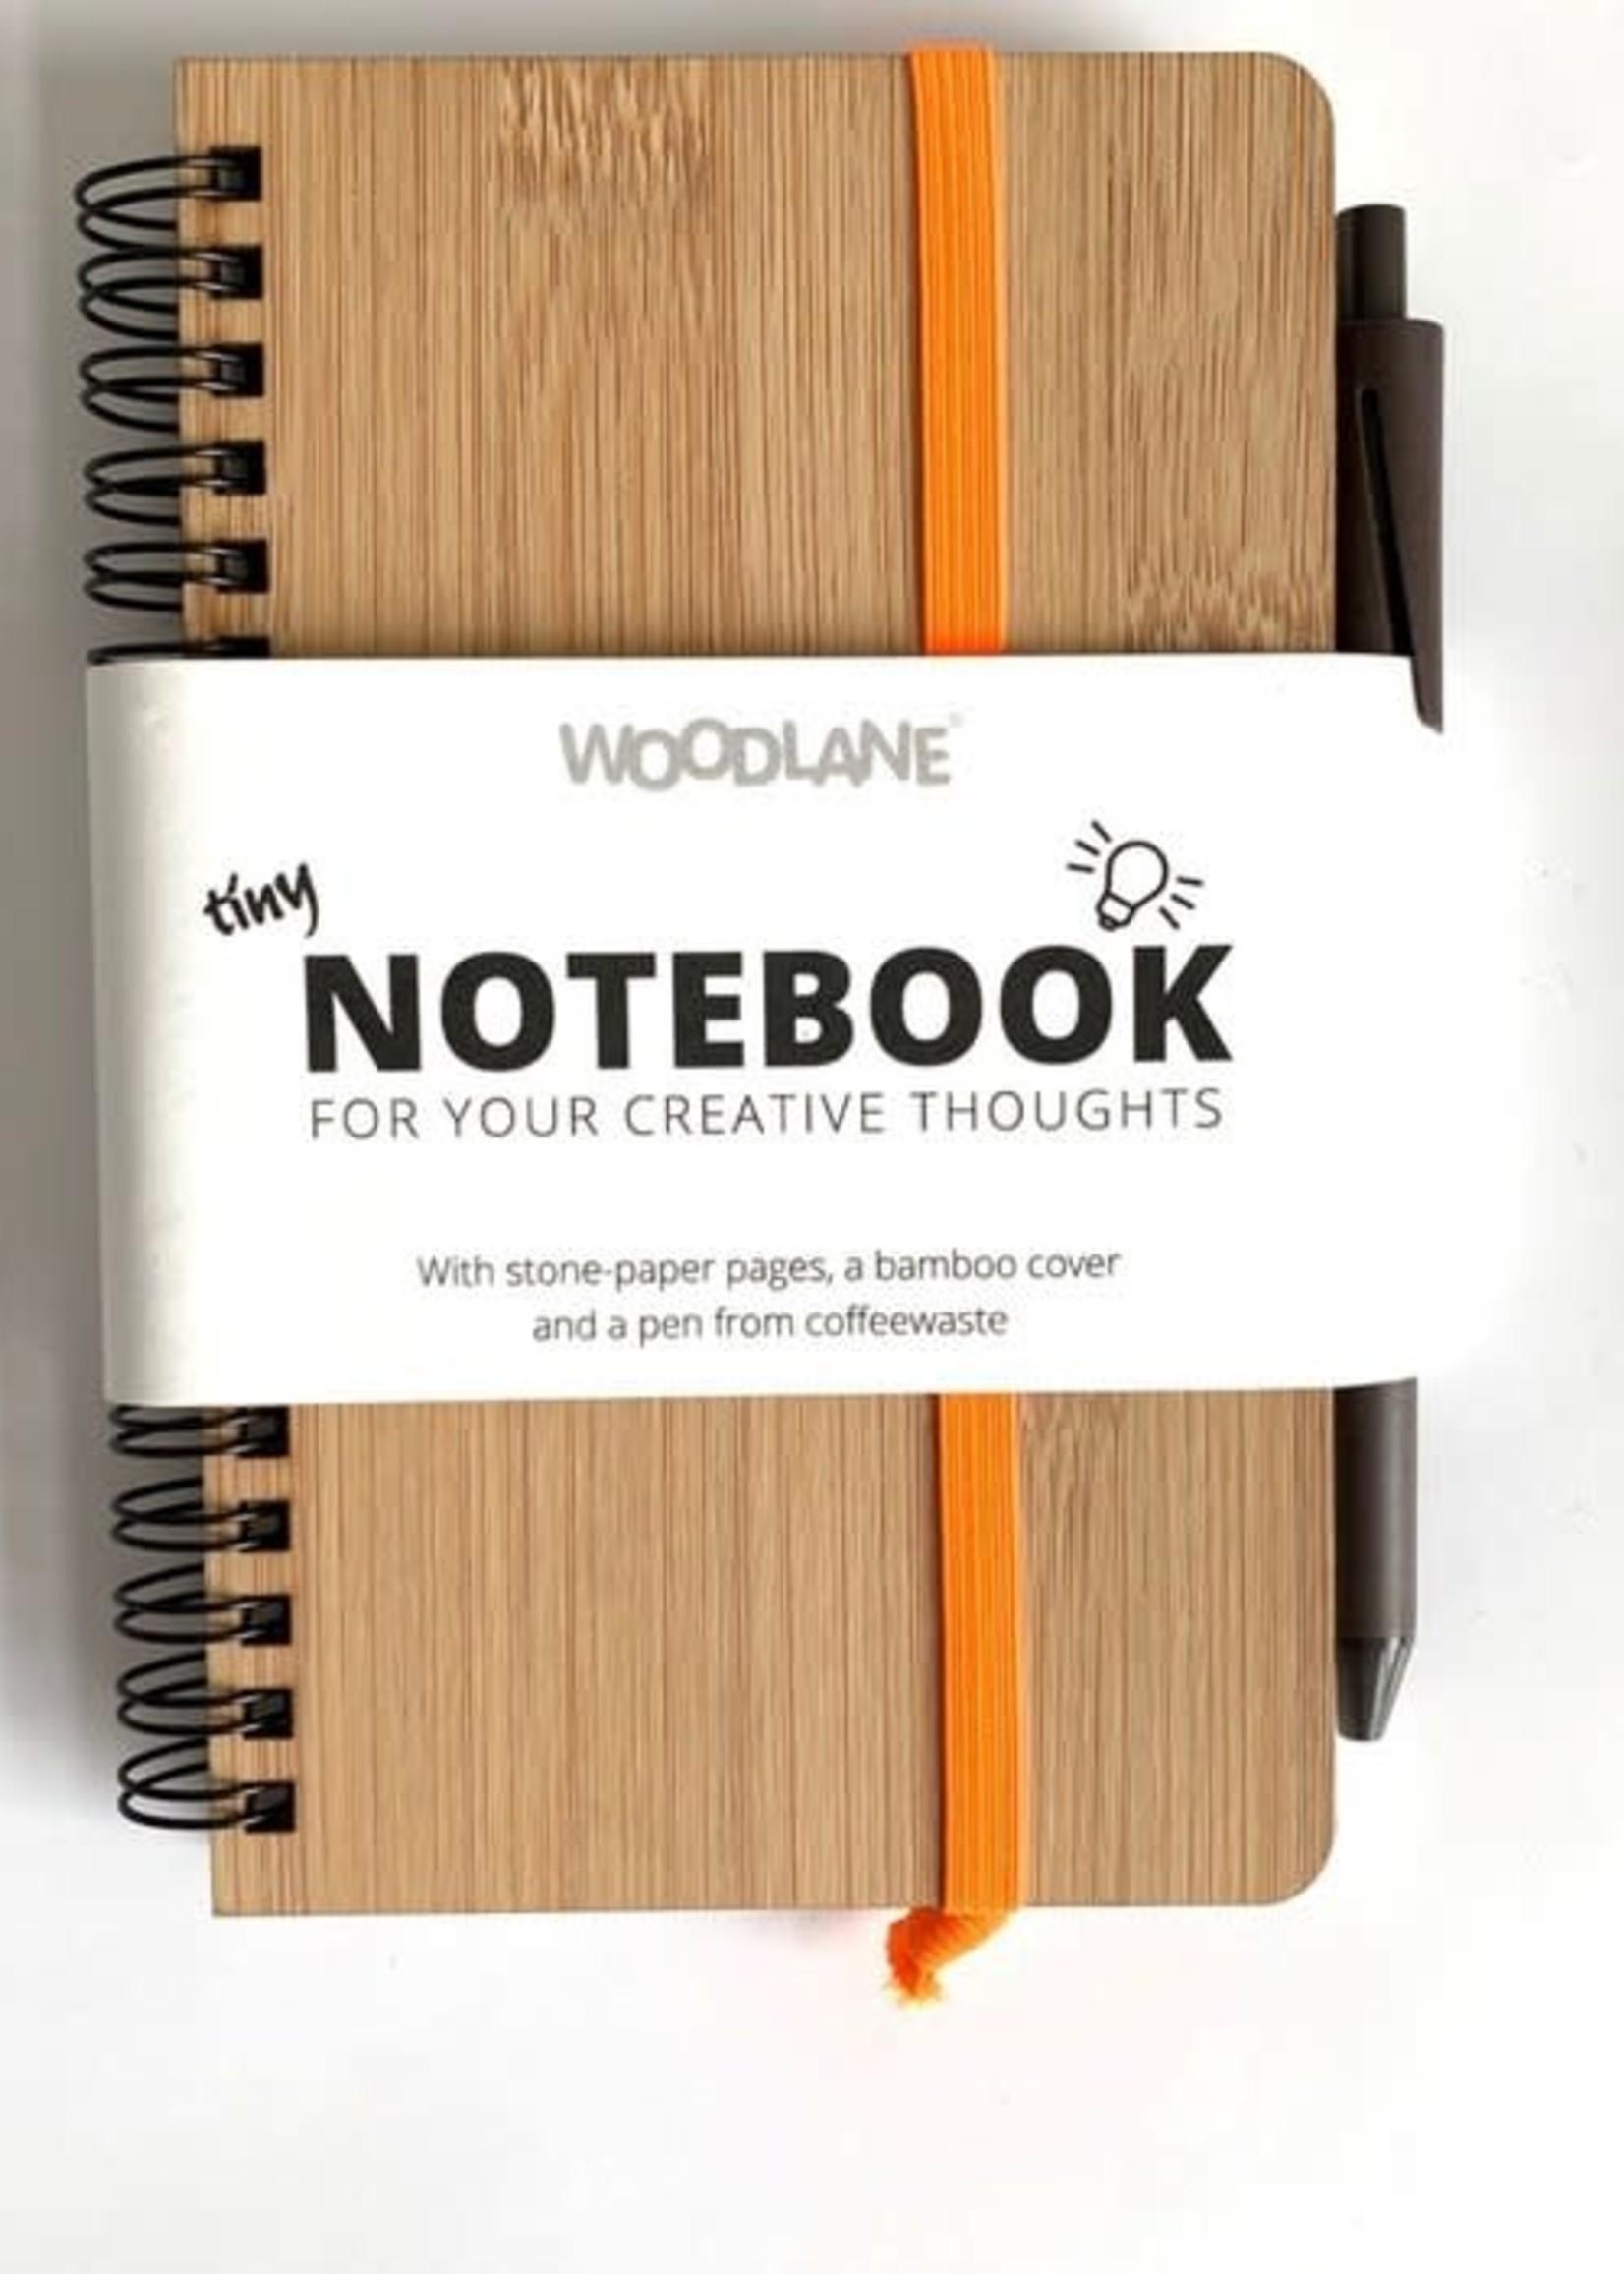 Woodlane Bamboo Notebook & Pen of coffeewaste